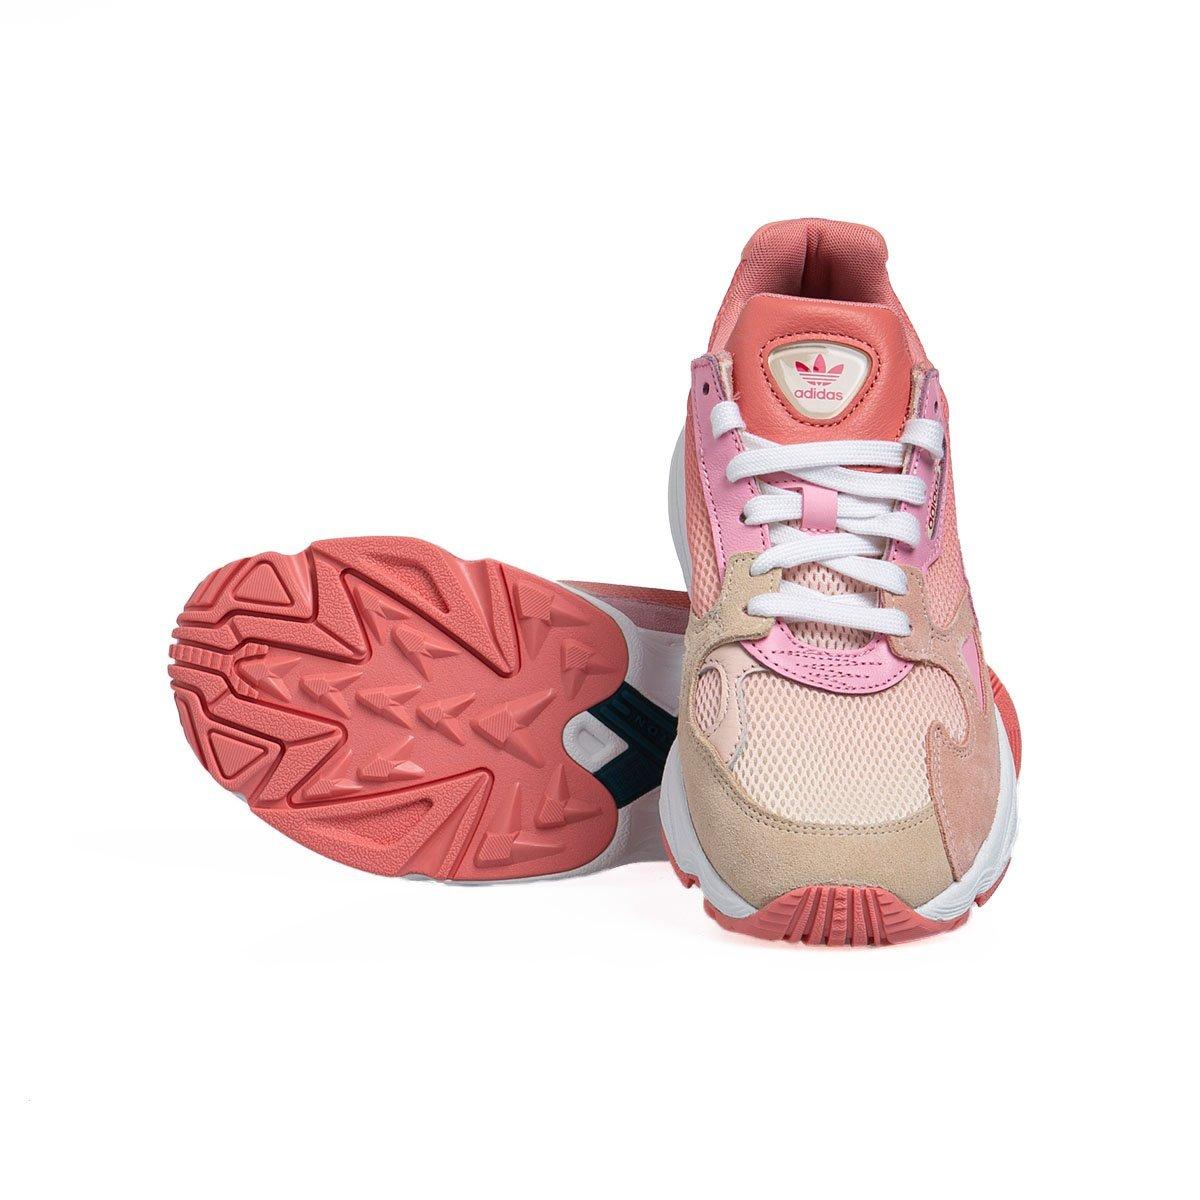 Sneakers damskie buty Adidas Originals Falcon W ecru tintice pinktrue pink (EF1964)